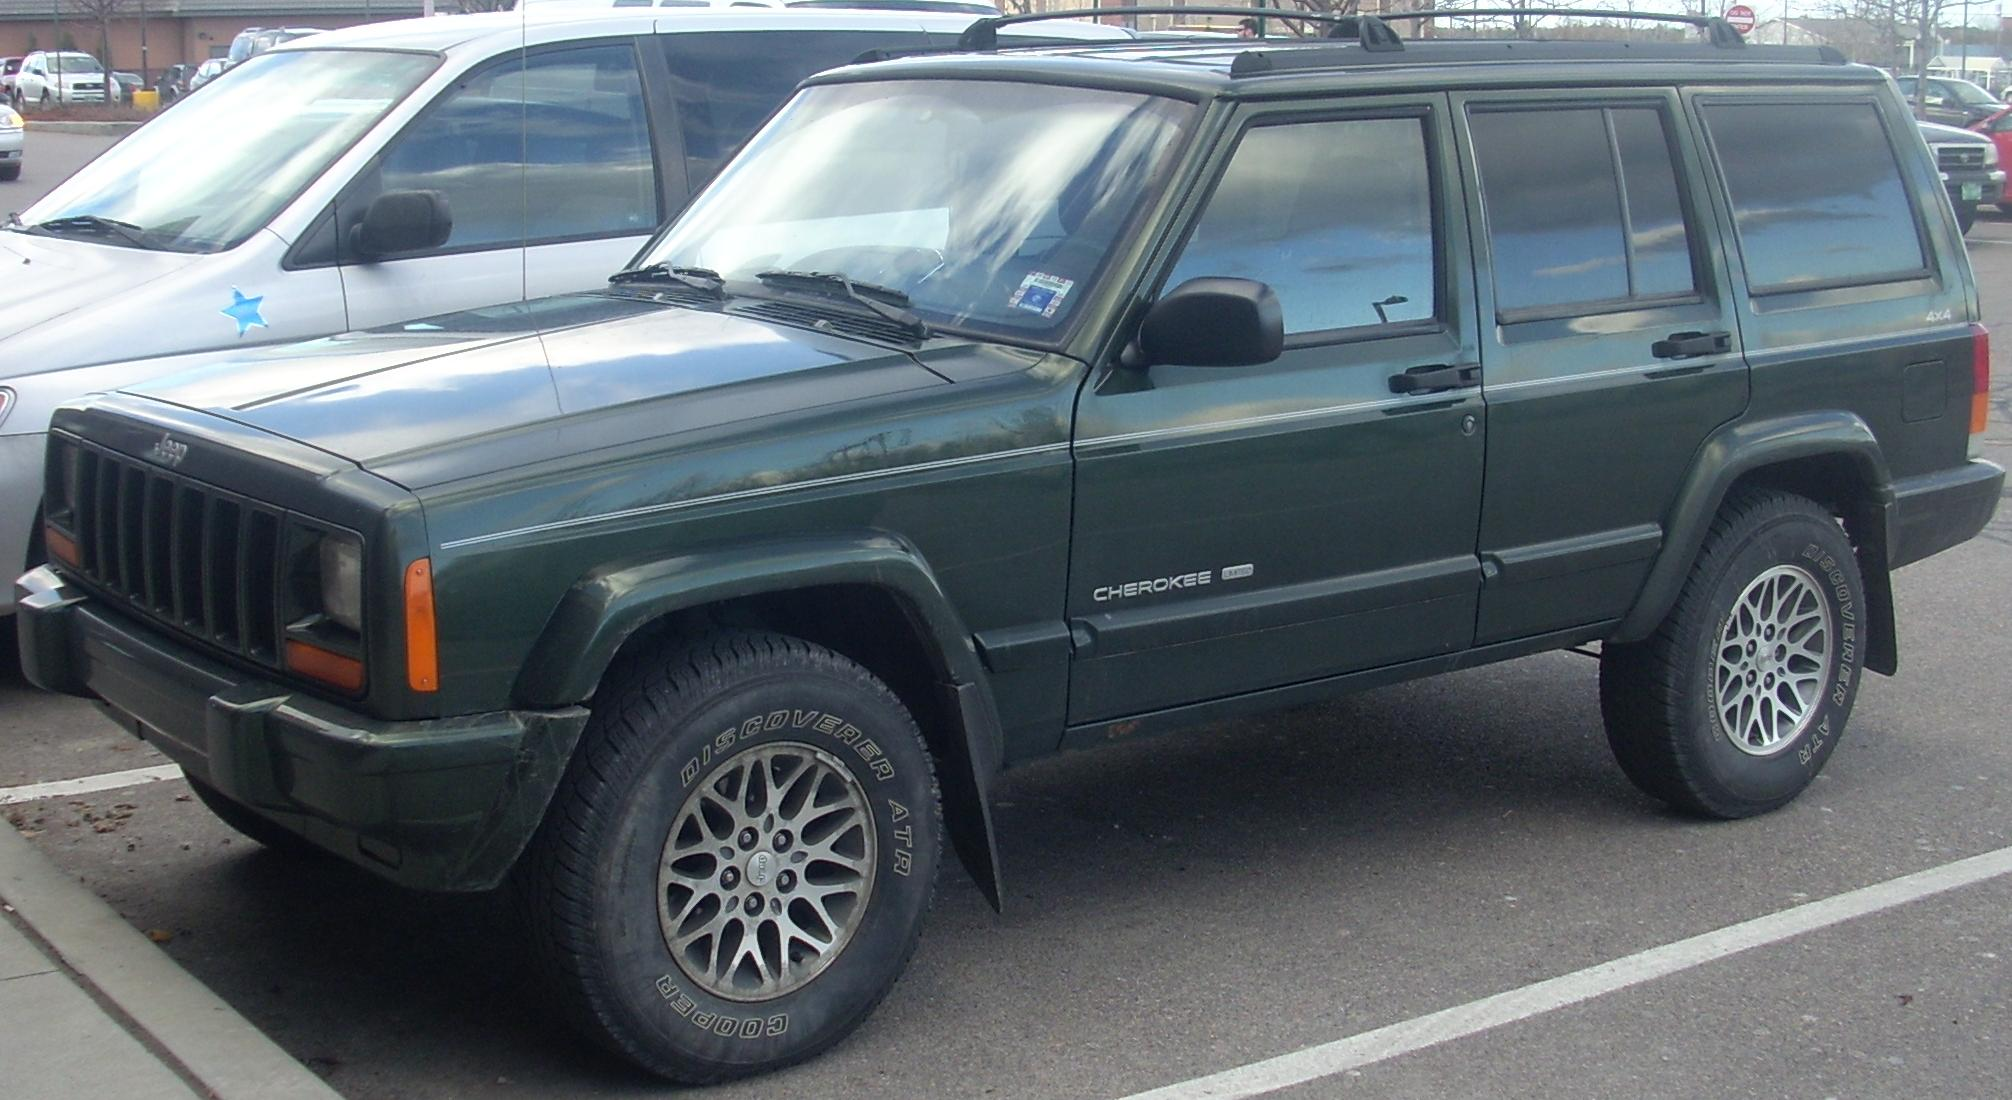 Jeep Cherokee Off Road >> File:'97-'99 Jeep Cherokee 4-Door.jpg - Wikimedia Commons